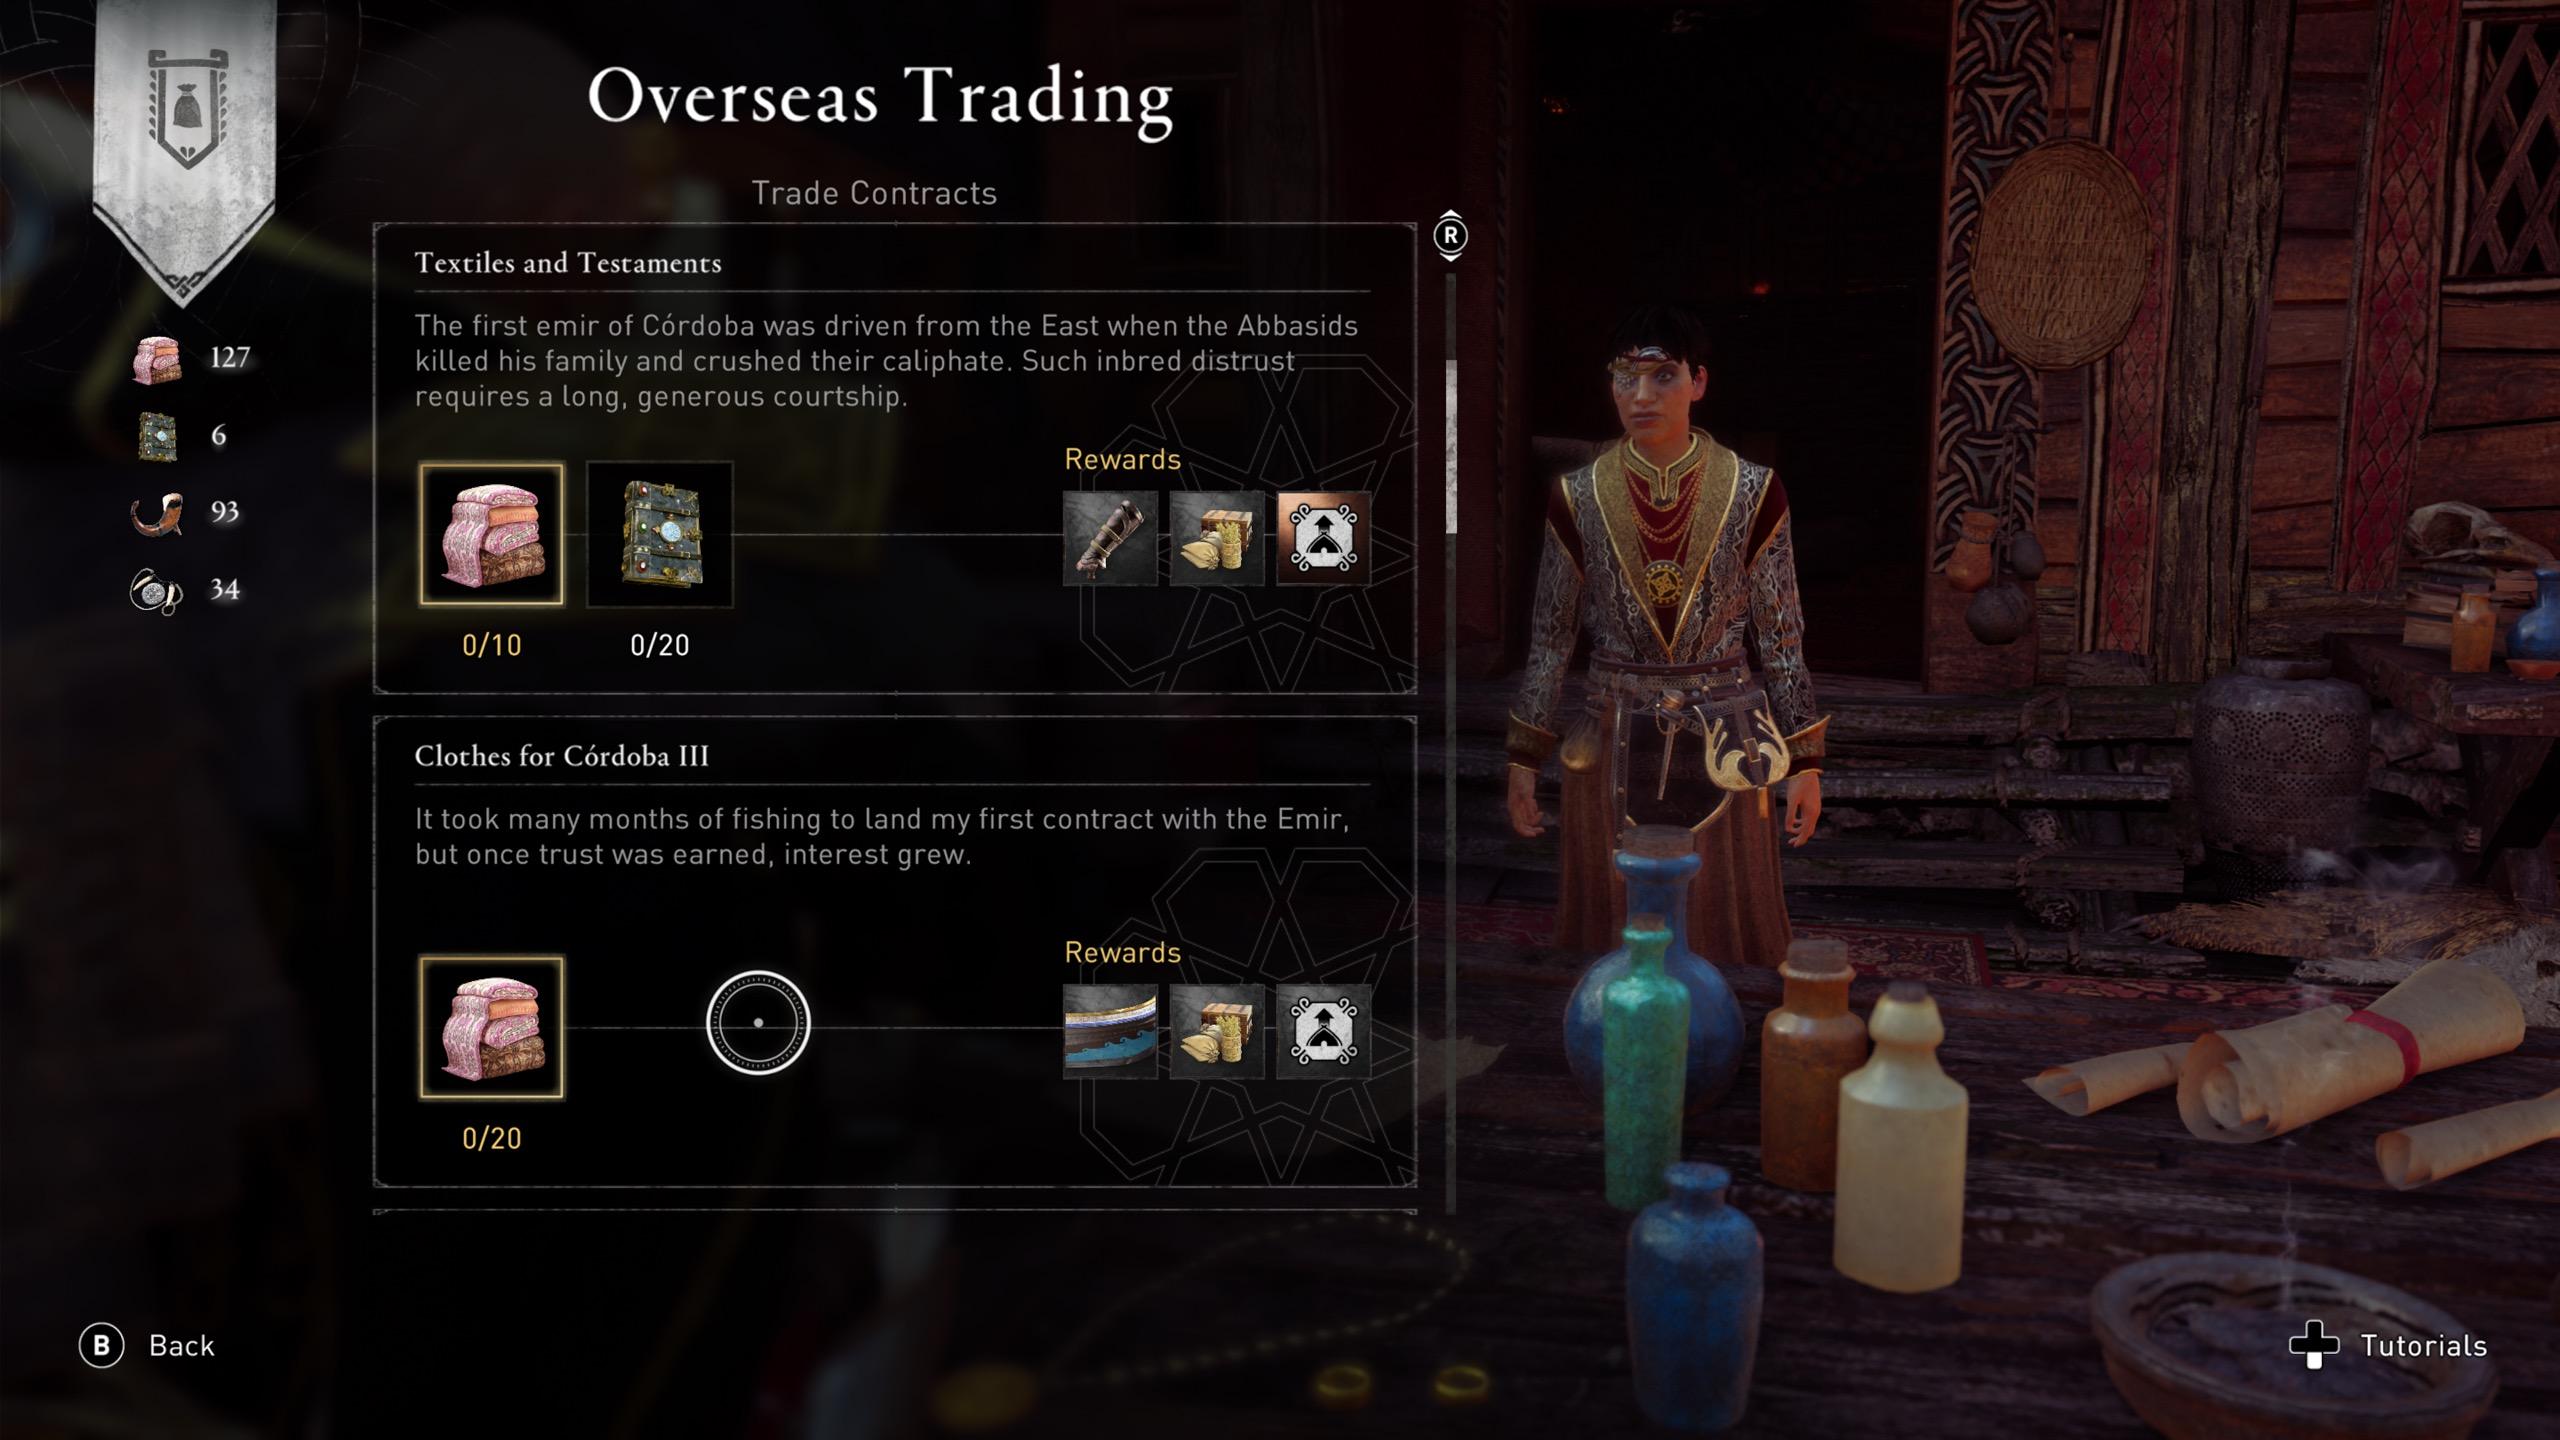 Assassin's Creed Valhalla Azar Overseas Trading